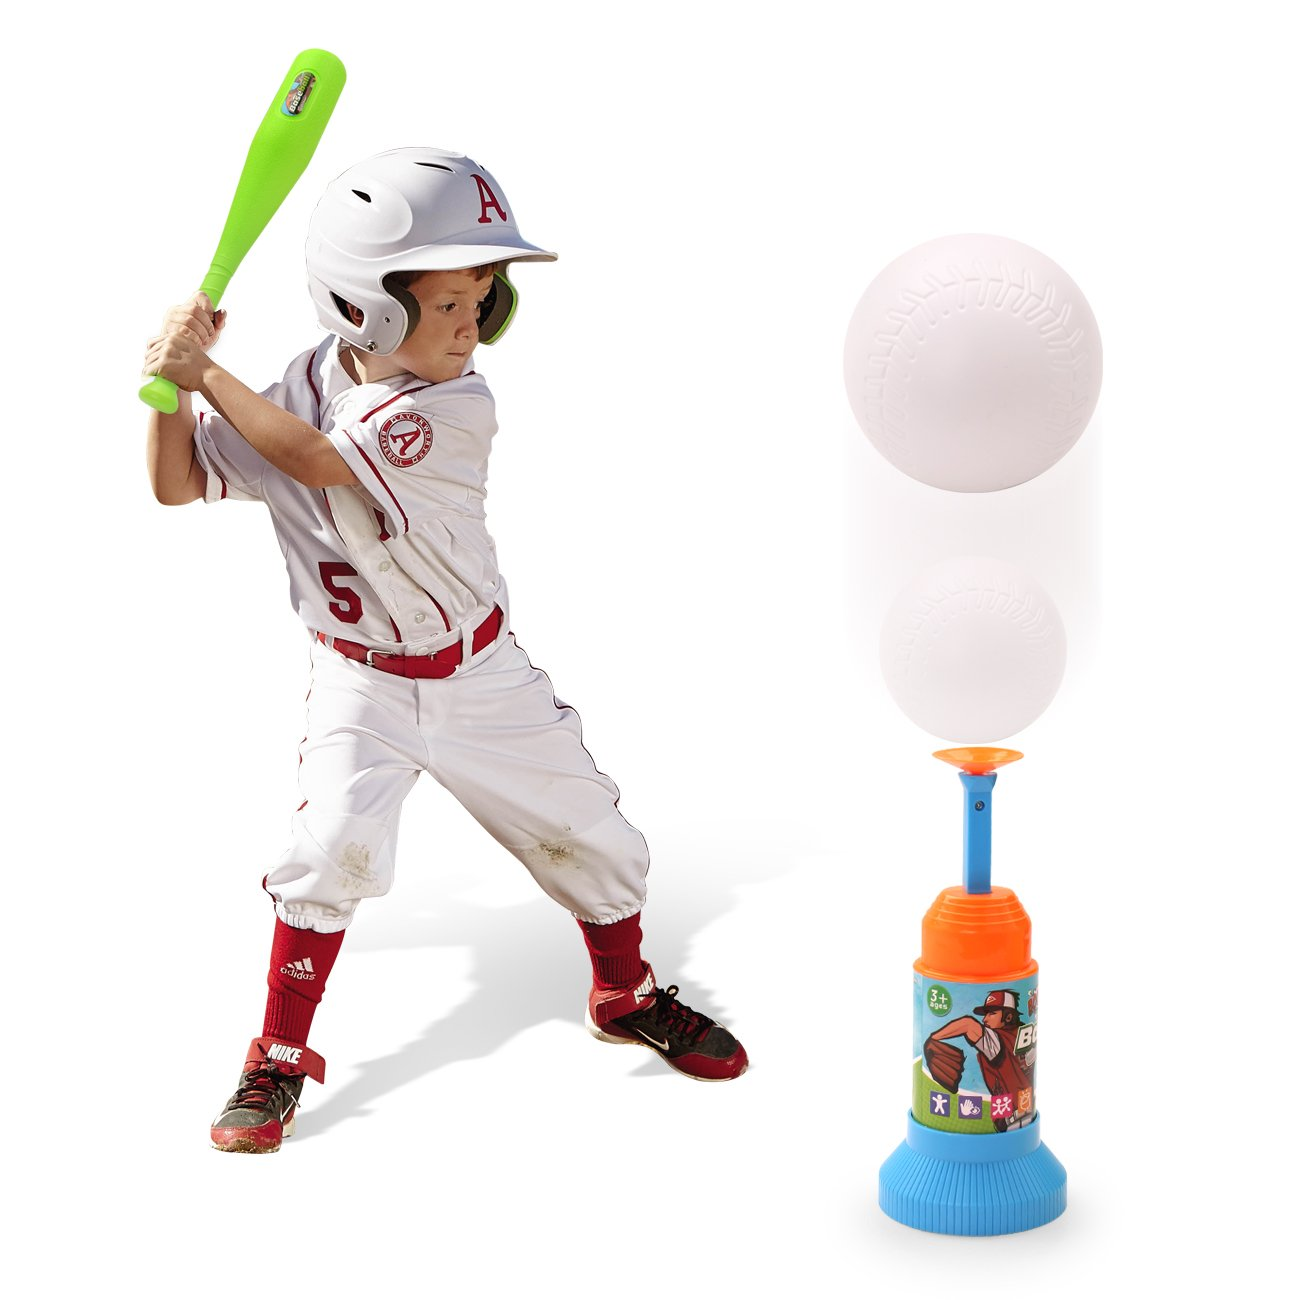 amazon com exercise n play training automatic launcher baseball